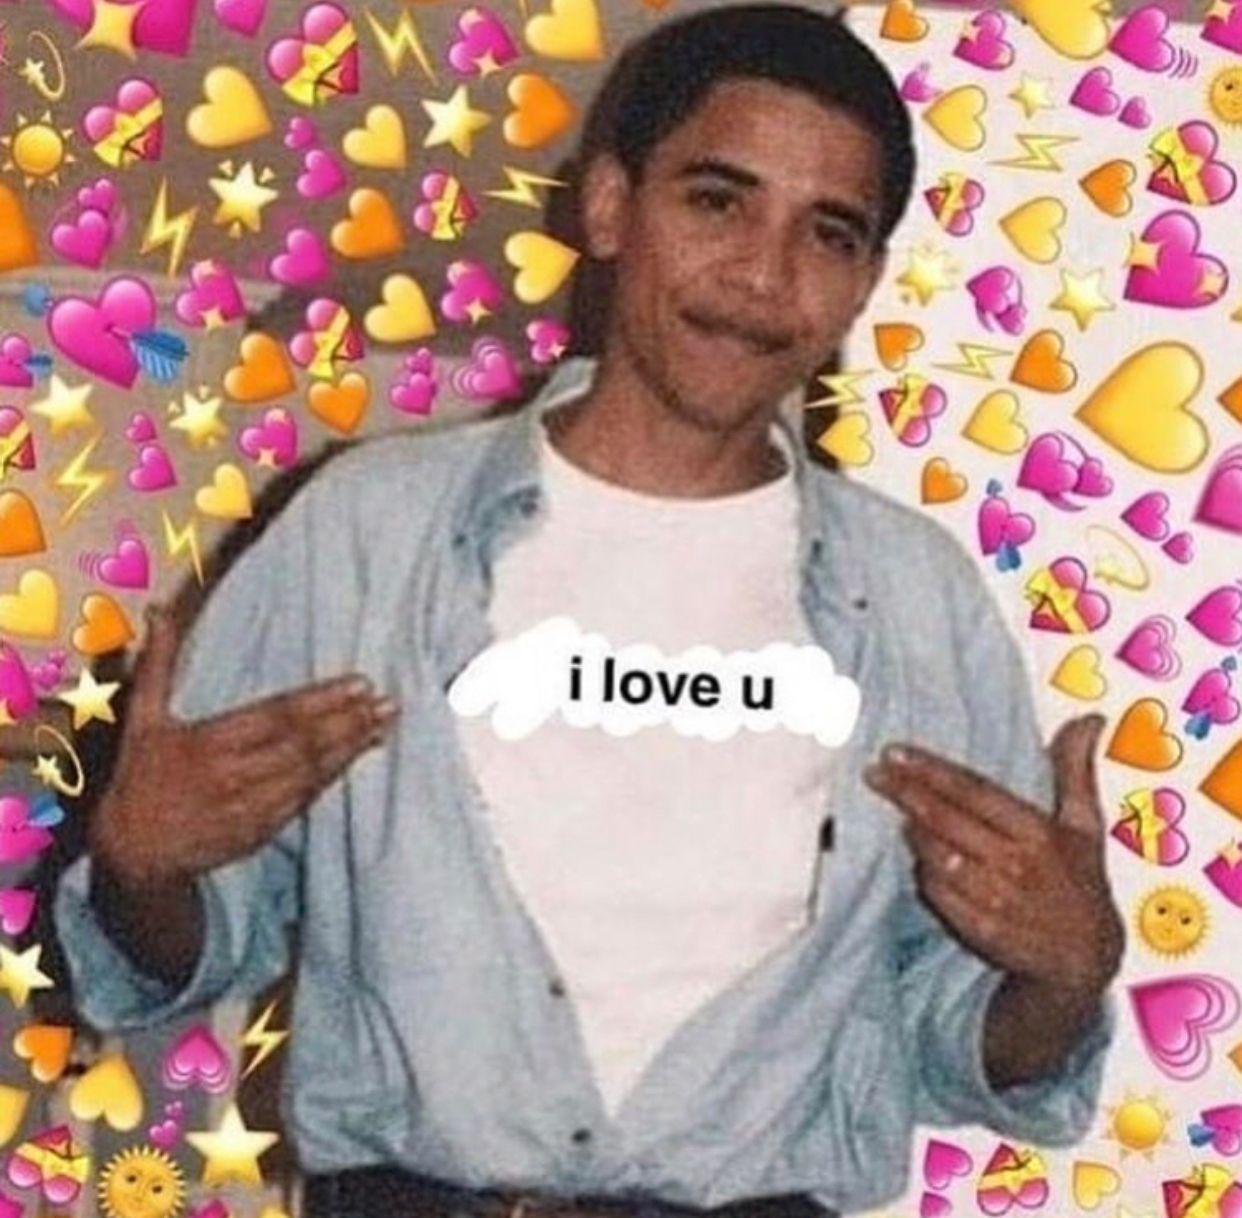 Pin By Destiny On My Life Cute Love Memes Love Memes New Memes